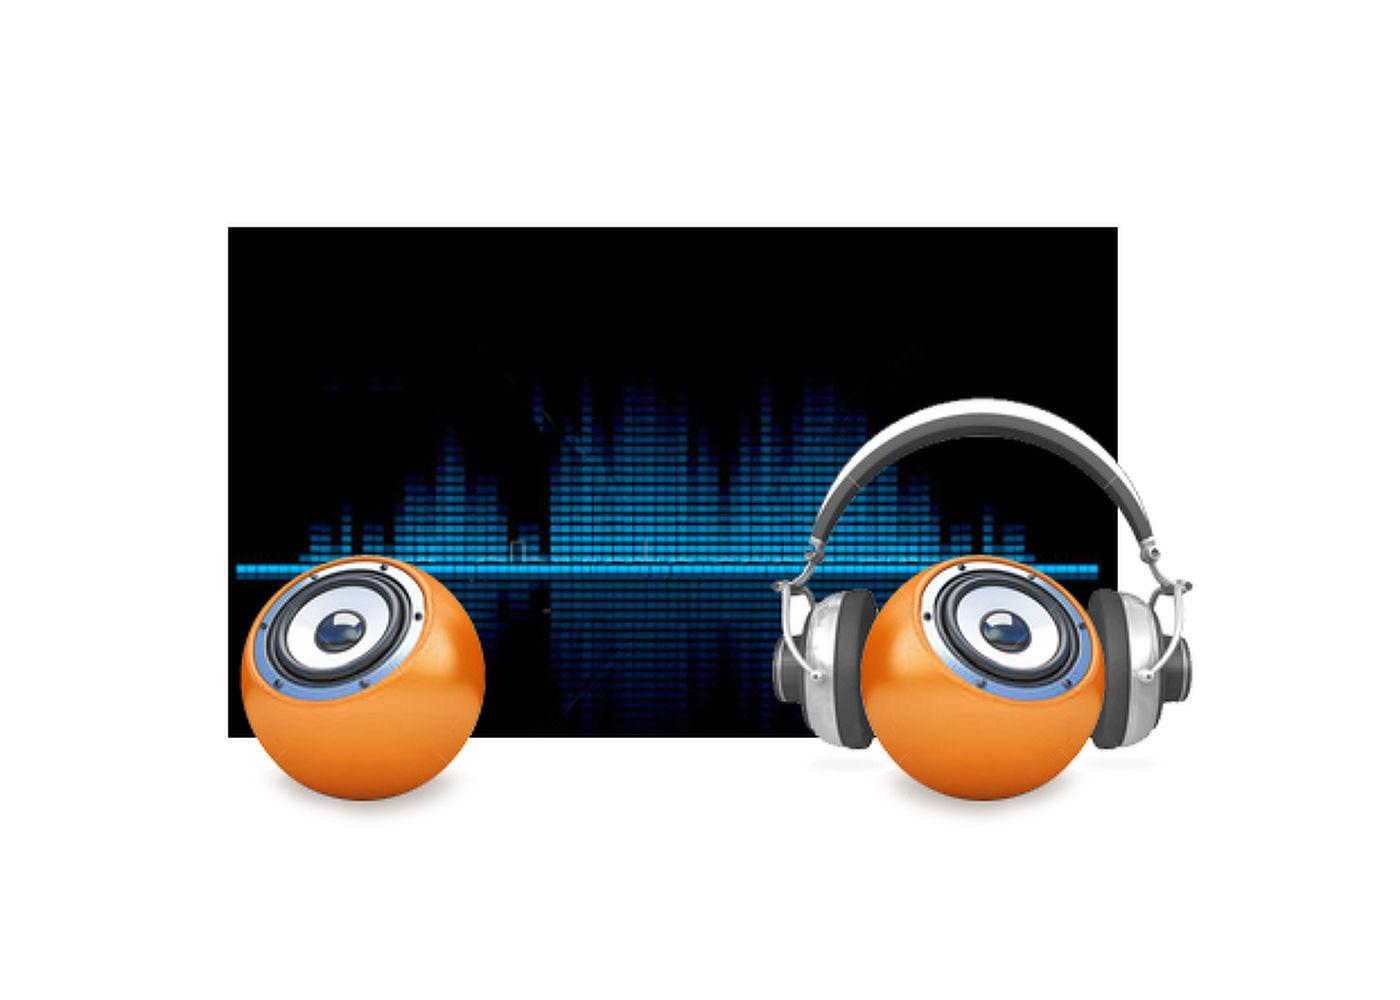 19b42202fbee10070d4d68bbc125fe31-speakers-headphone.jpg [MS-15481123719086096-0091137095-FR]/Catalogue produits RDC et GM / Online